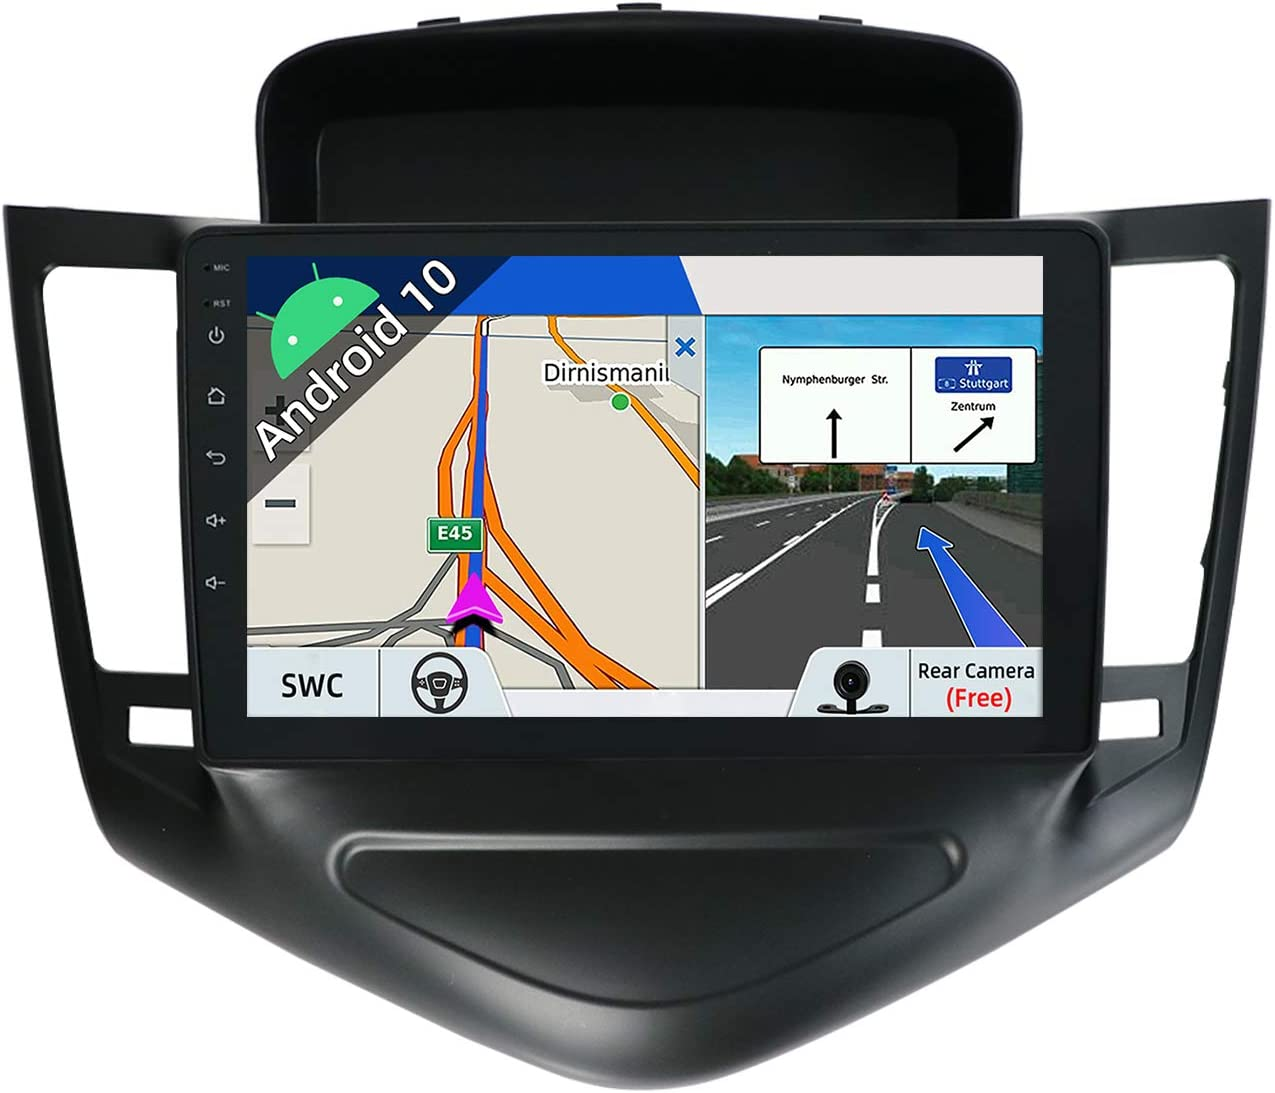 JOYX Android 10 Autoradio para Chevrolet Cruze (2009-2014) - [2G+32G] - Gratis Cámara Canbus - 9 Pulgada GPS 2 DIN - IPS 2.5D - Apoyo Dab 4G WLAN Bluetooth Carplay Mandos de Volante Google Mirrorlink